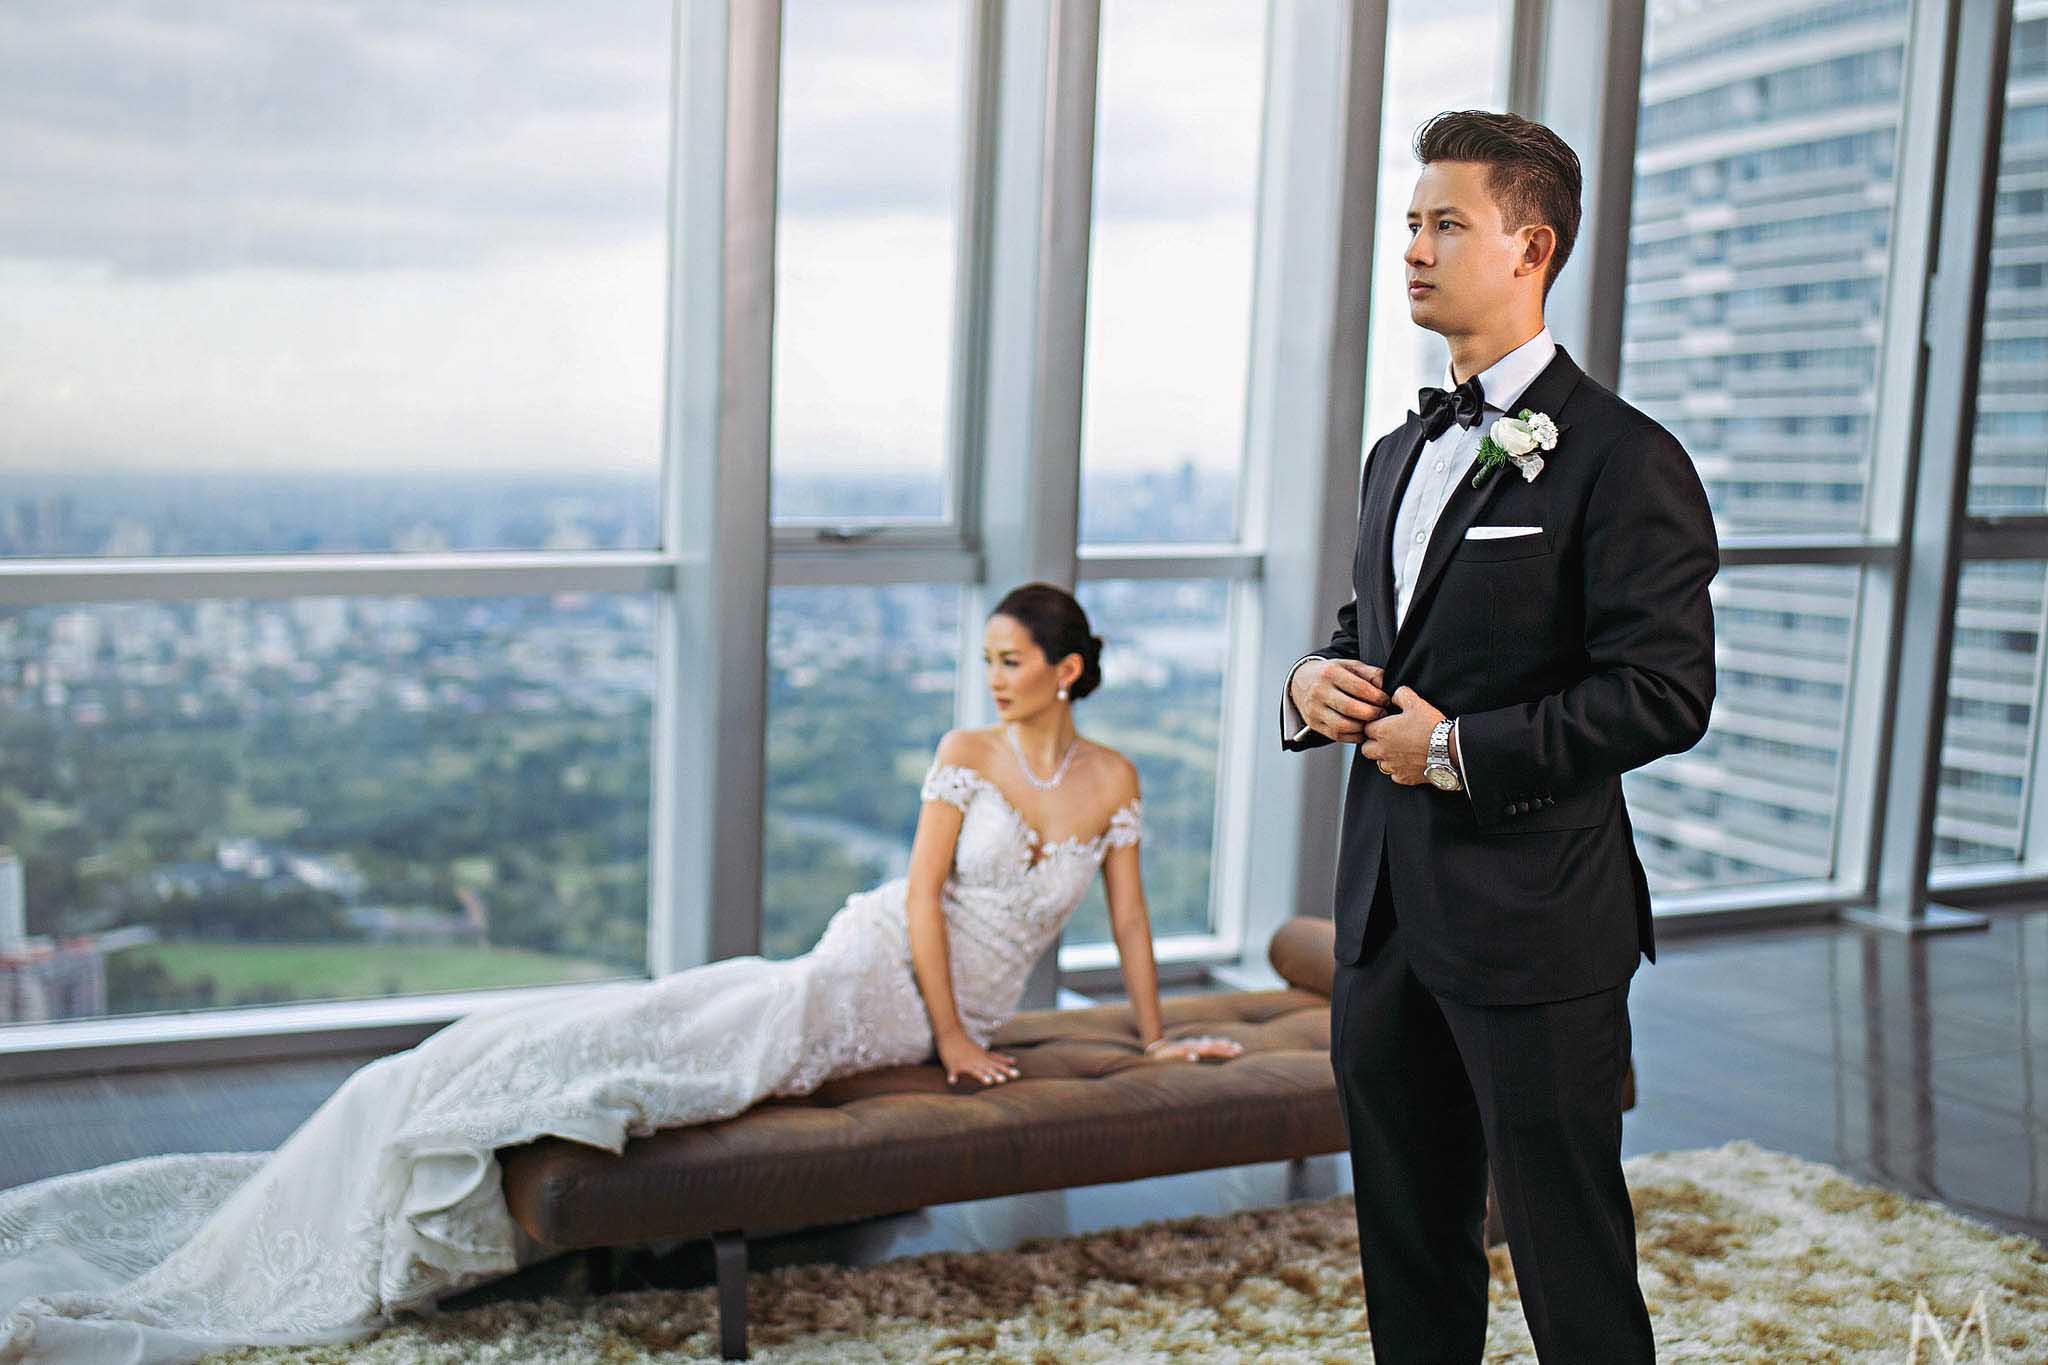 The Wedding of Kim and Graeme | Modern Destination Wedding ...